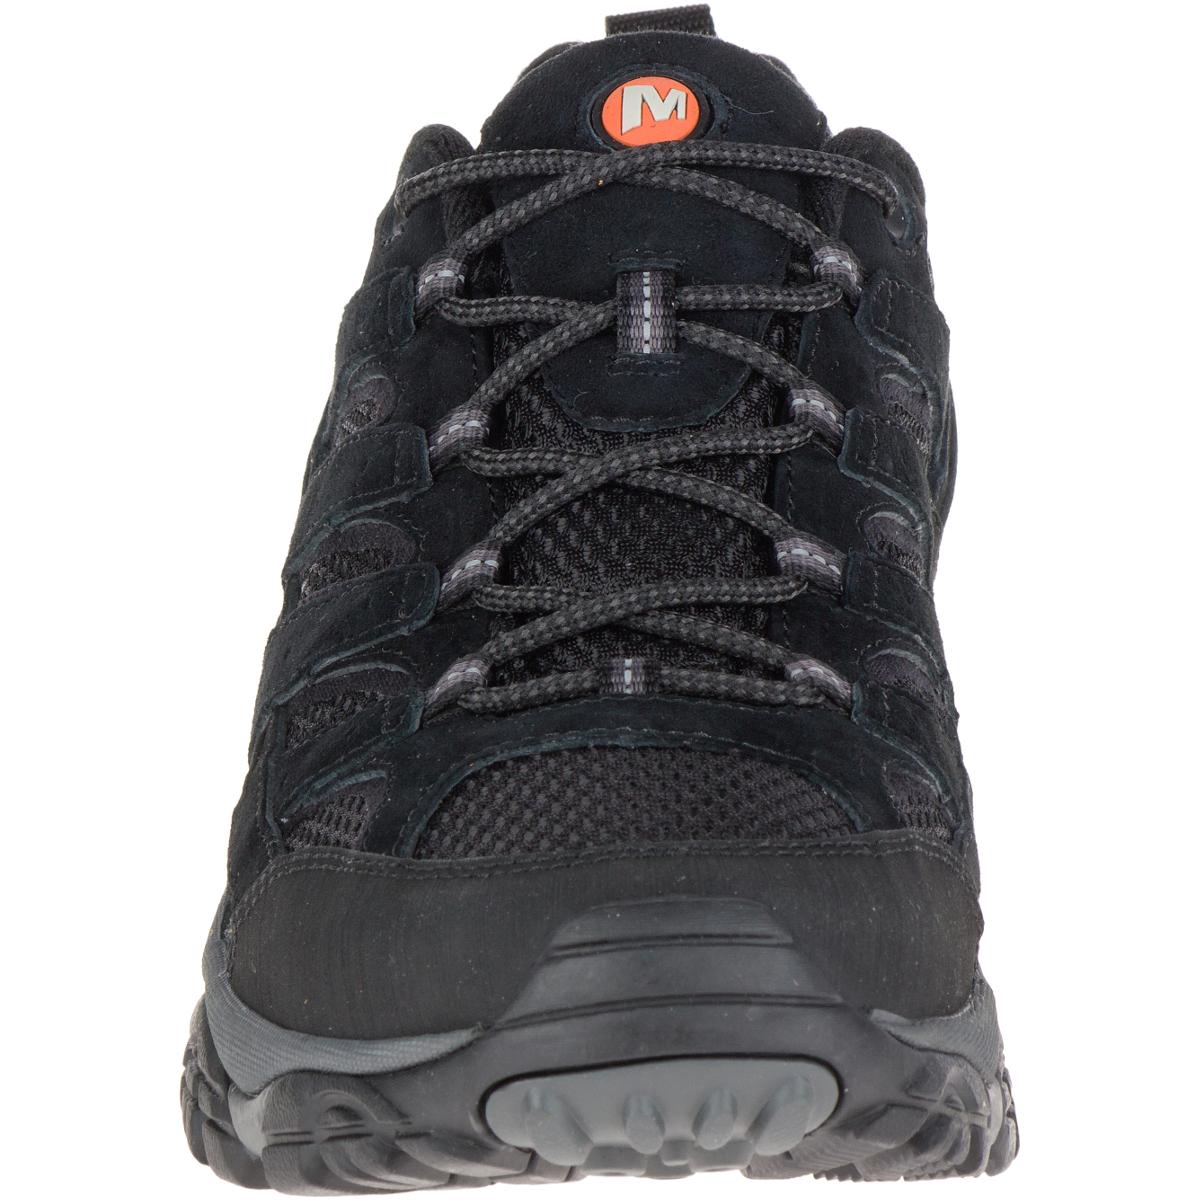 Moab 2 Ventilator Hiking Shoes